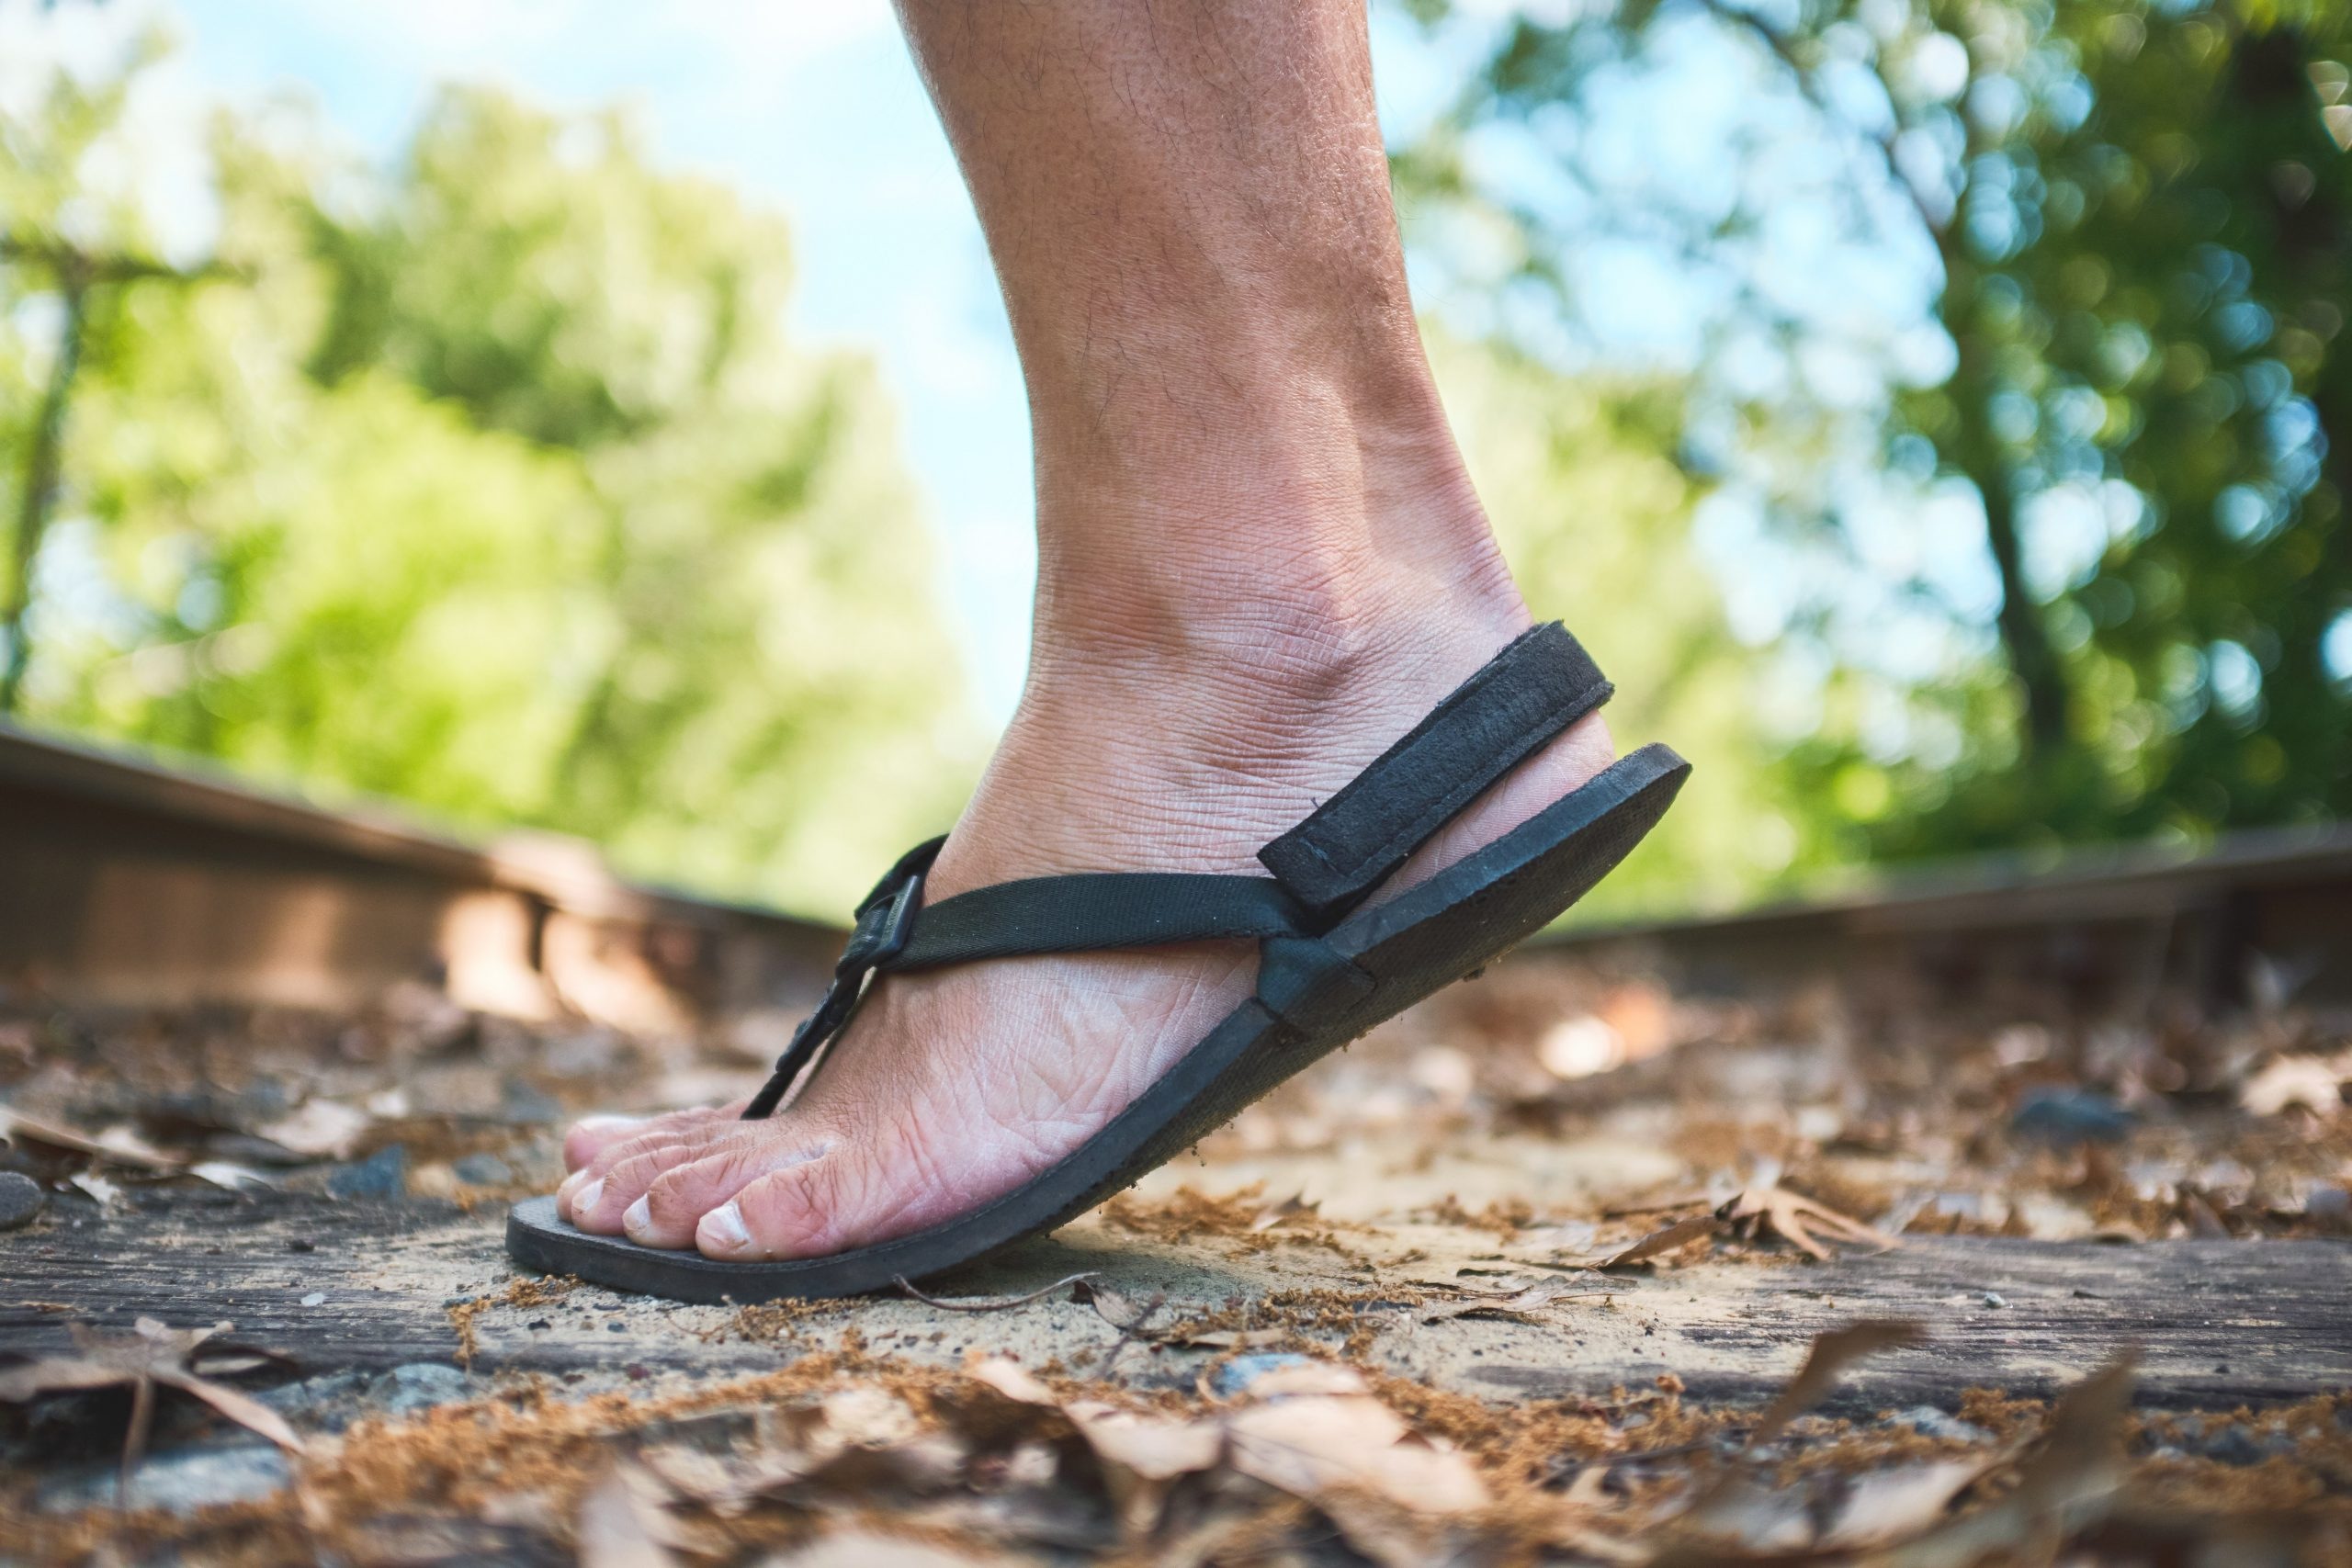 flexible, adjustable, and comfortable heel straps